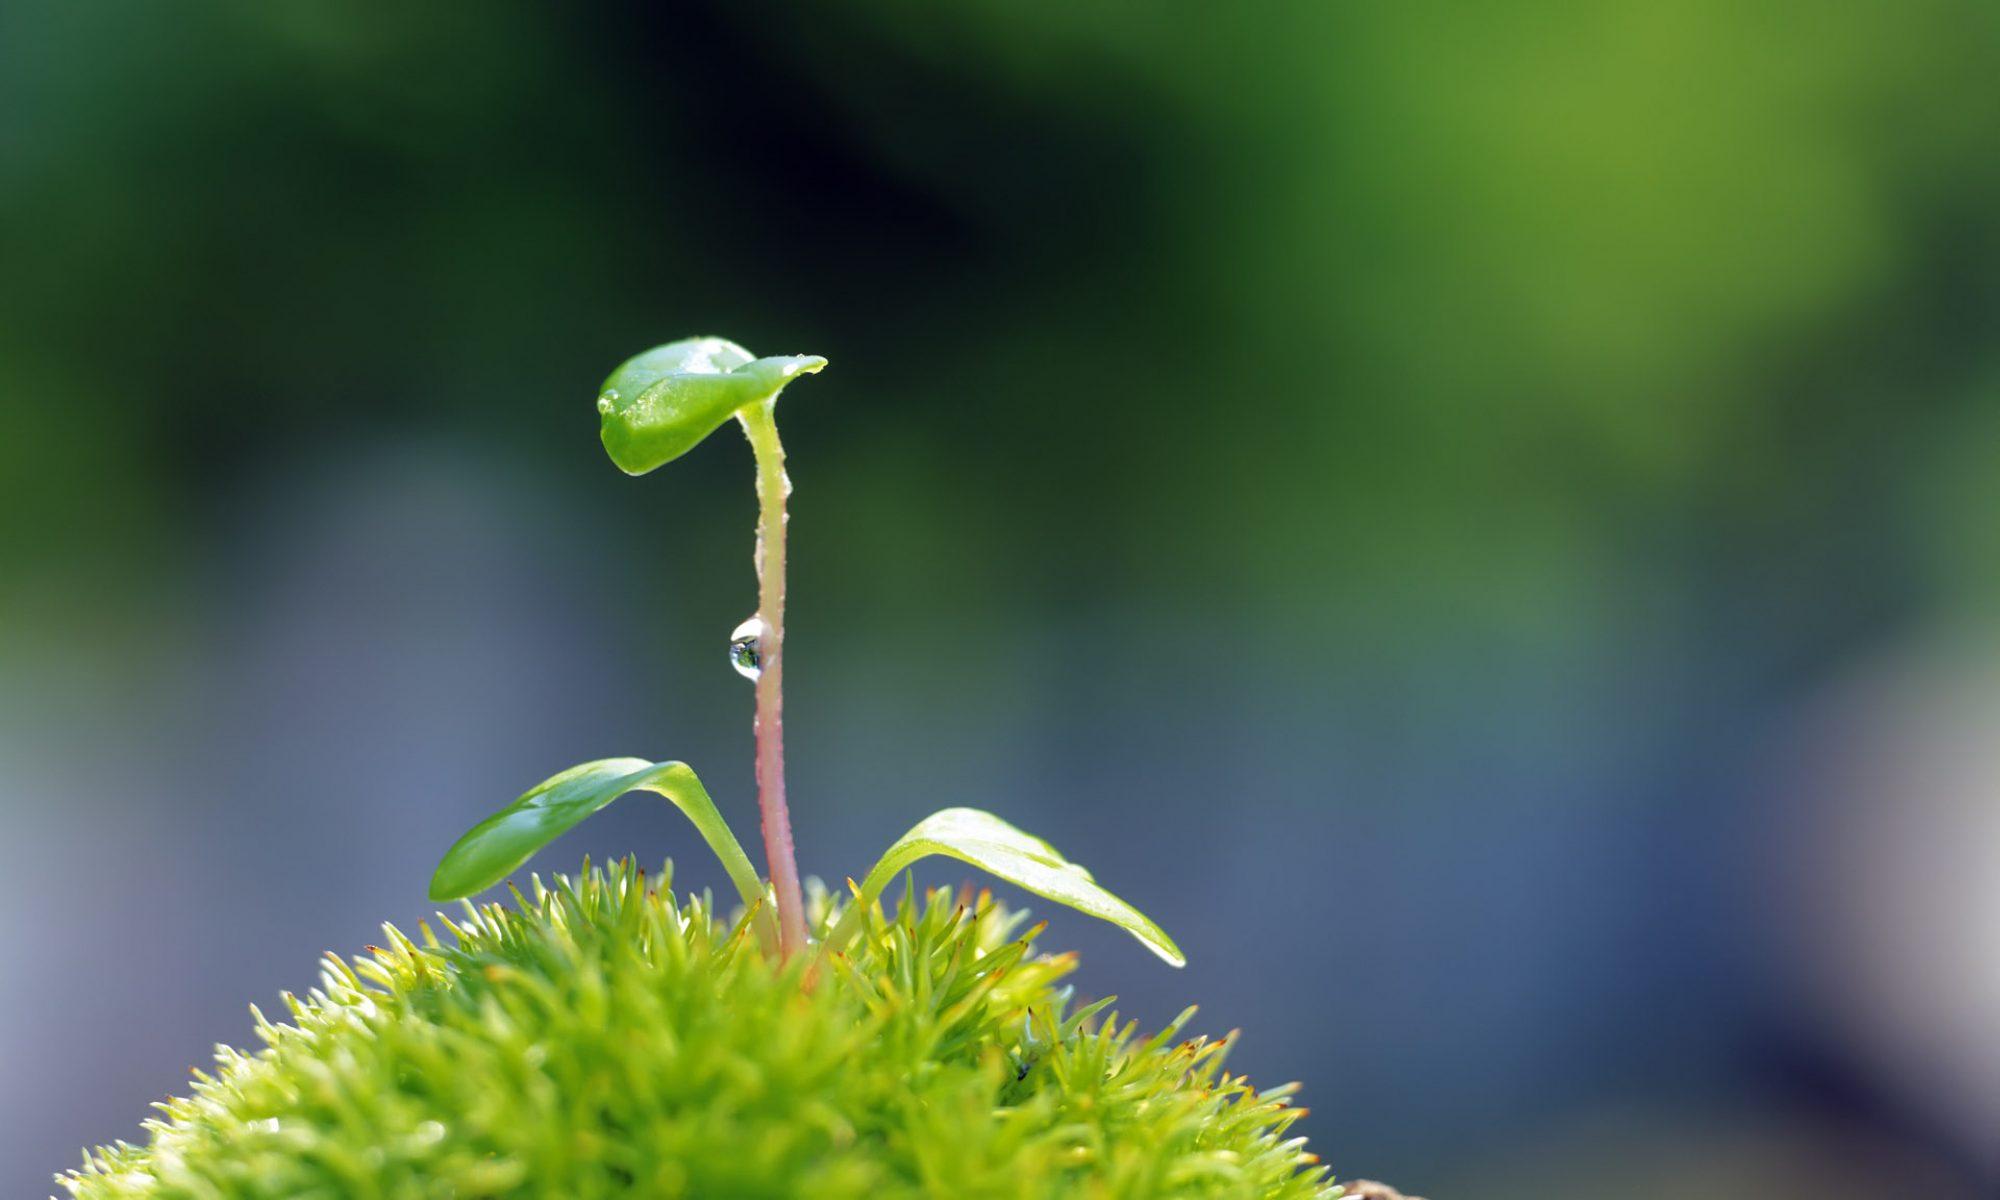 En VerdeSTI nos dedicamos a integrar conceptos innovadores, seguros y rentables.